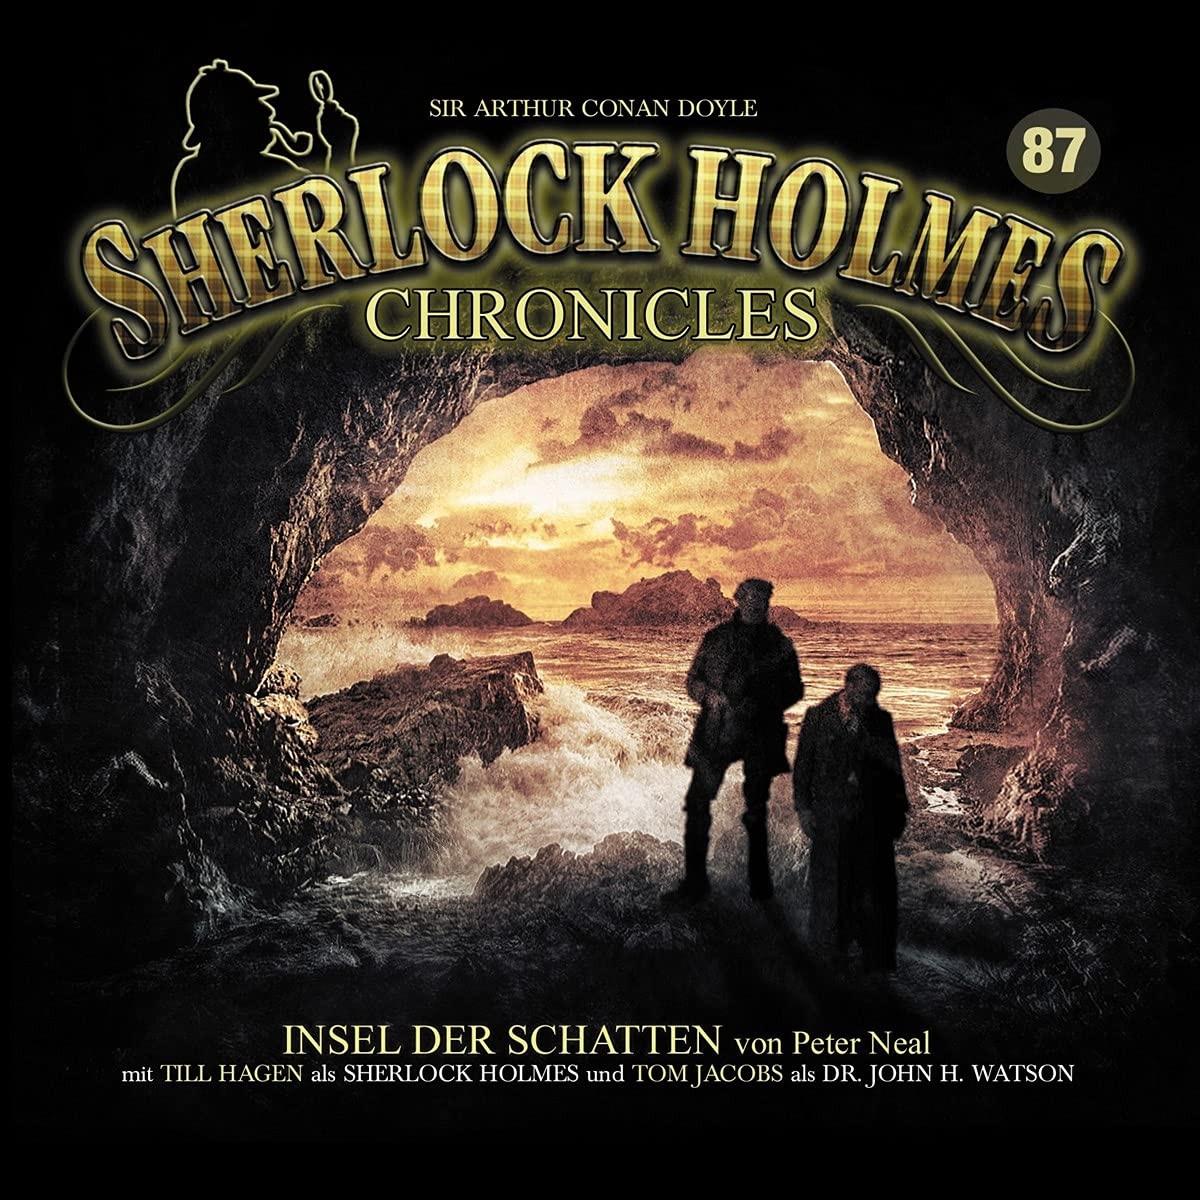 Sherlock Holmes Chronicles 87 Insel der Schatten